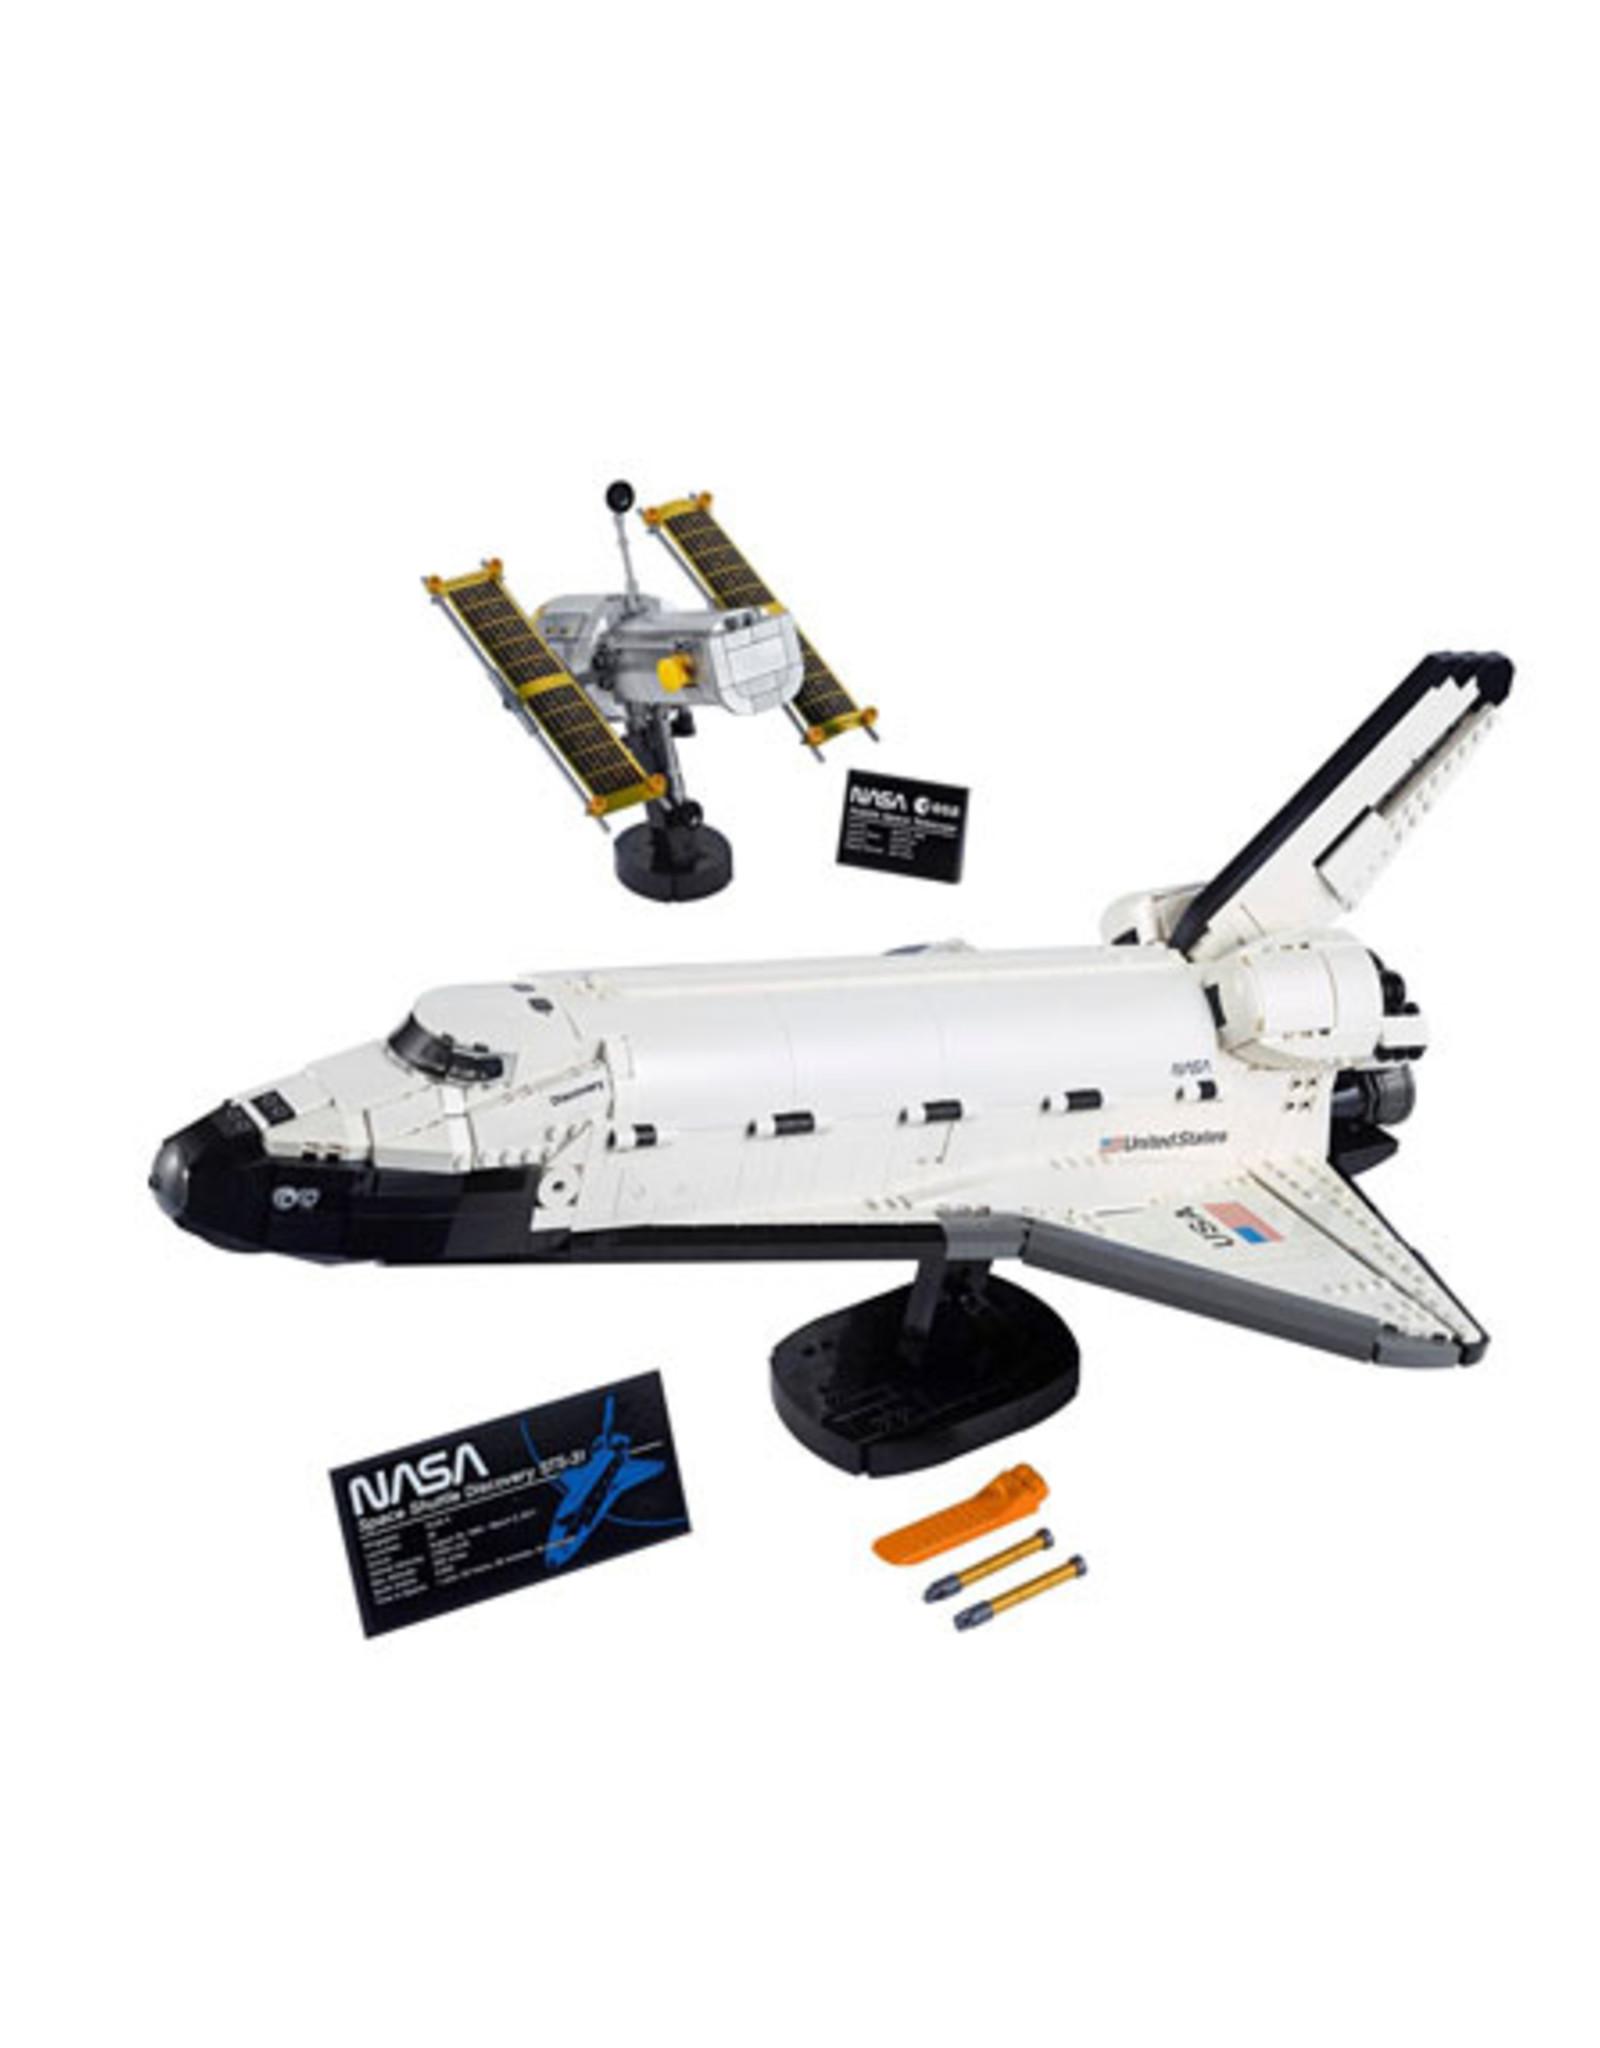 LEGO LEGO 10283 NASA Space Shuttle Discovery CREATOR Expert